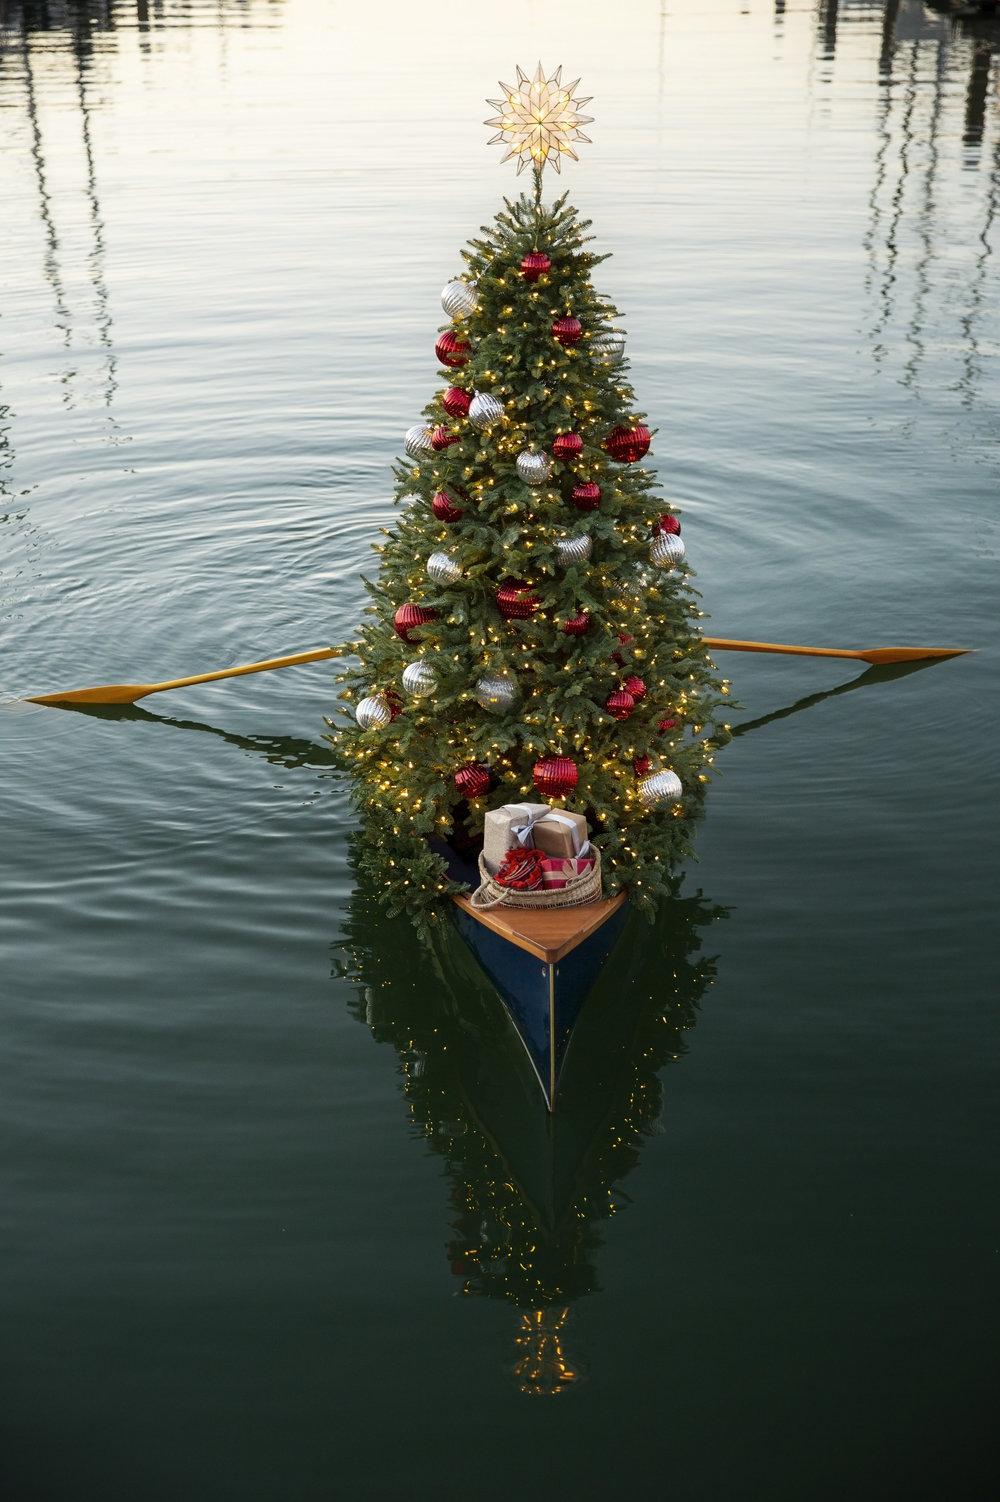 Christmas-in-July_Tree-in-Boat-90.jpg